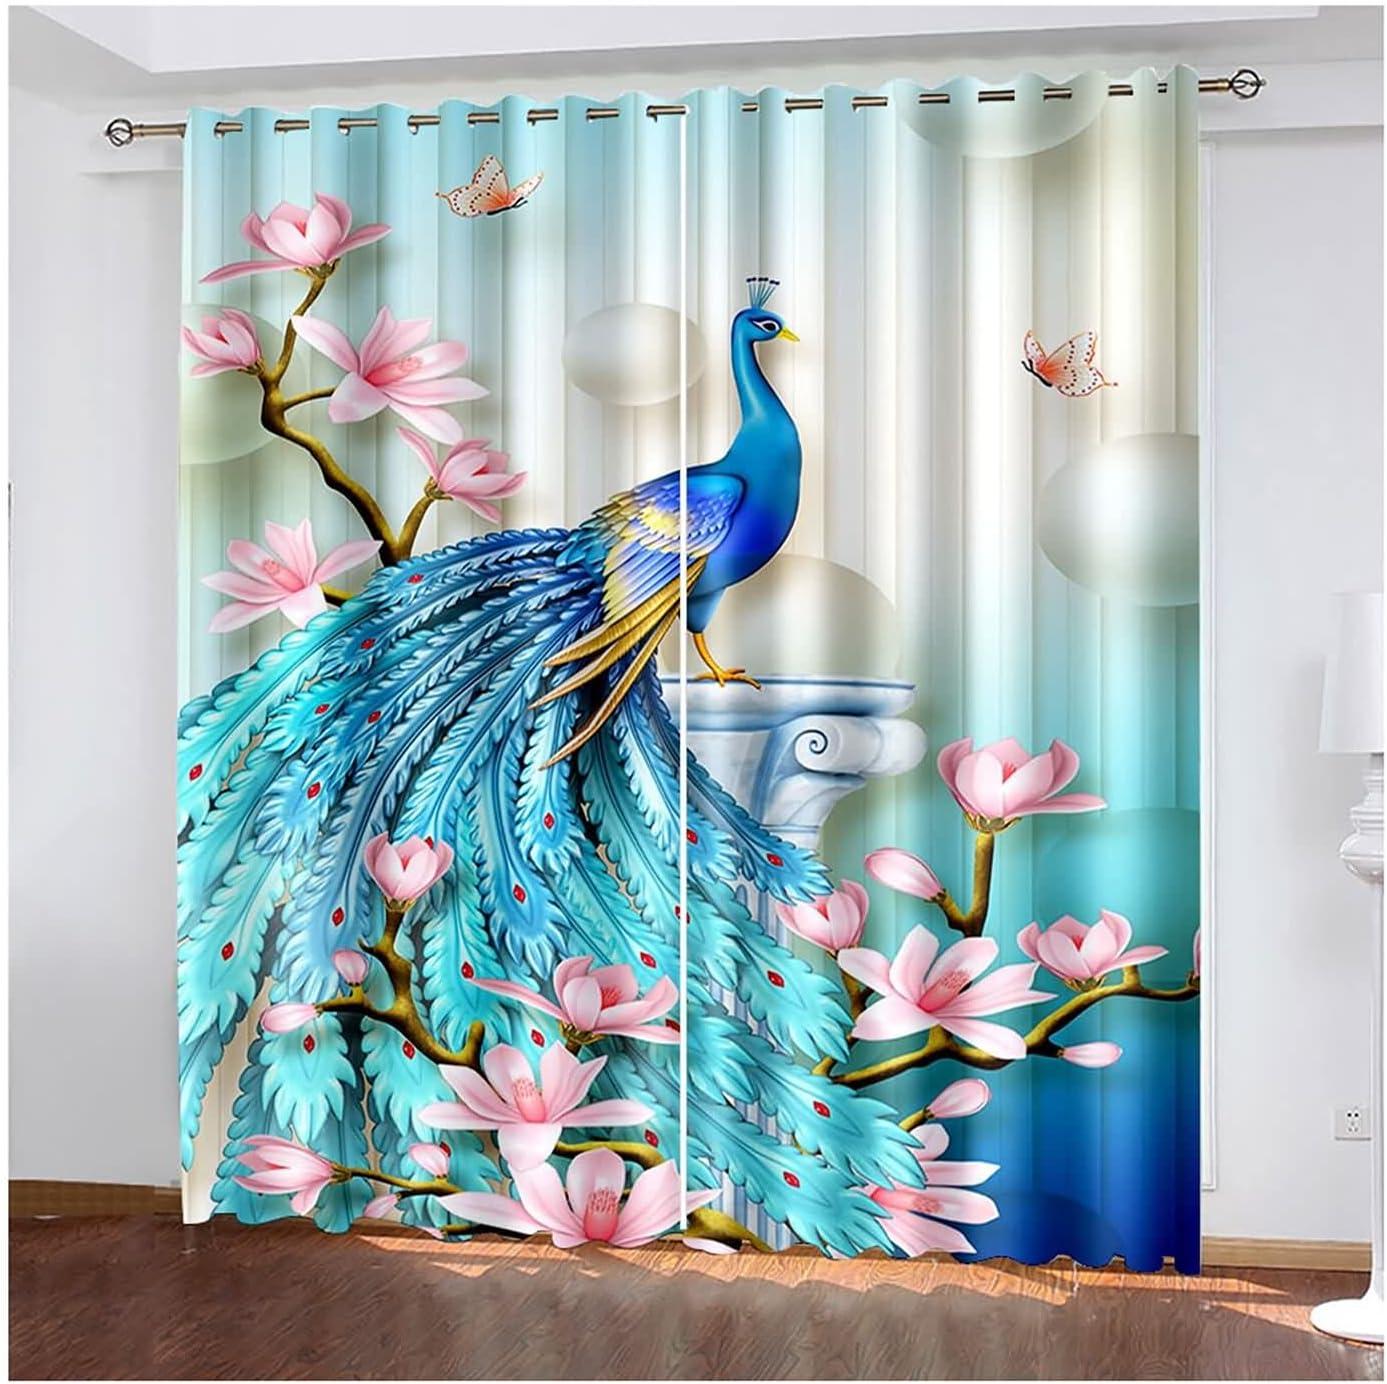 Daesar low-pricing Window Curtains cheap 2 Panels Eyelet Bedroom Peacock